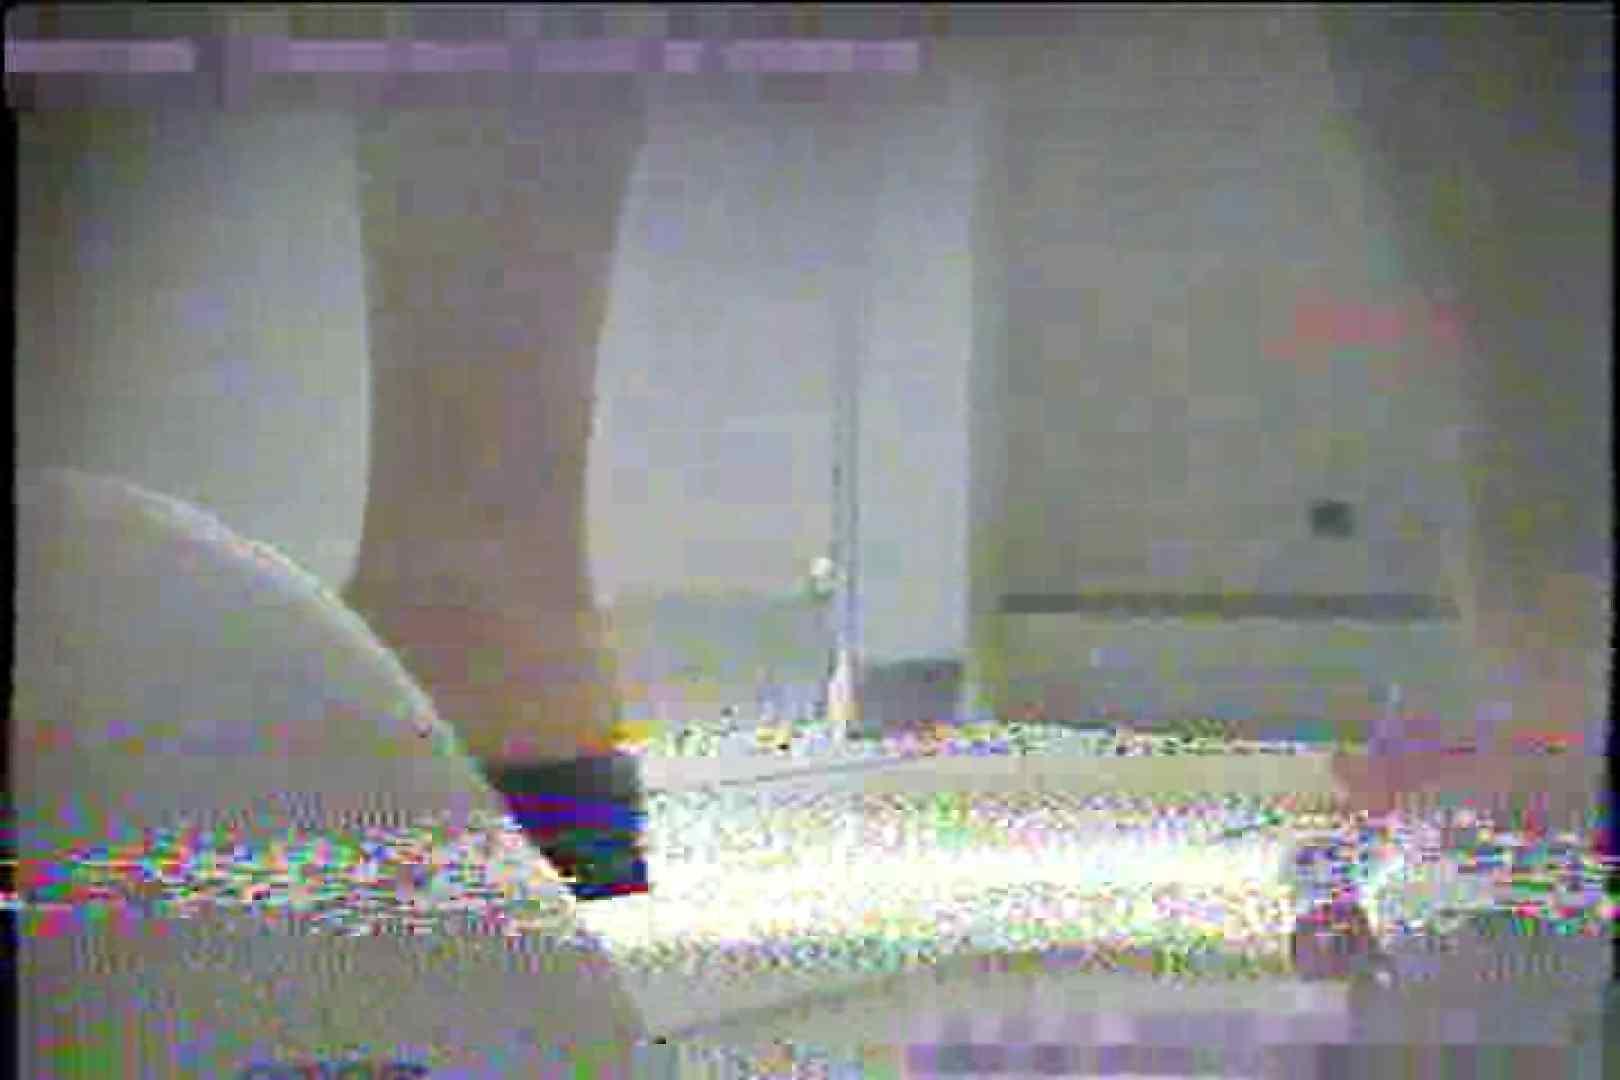 2点盗撮洗面所潜入レポートVol.1 洗面所 | 盗撮  44pic 43